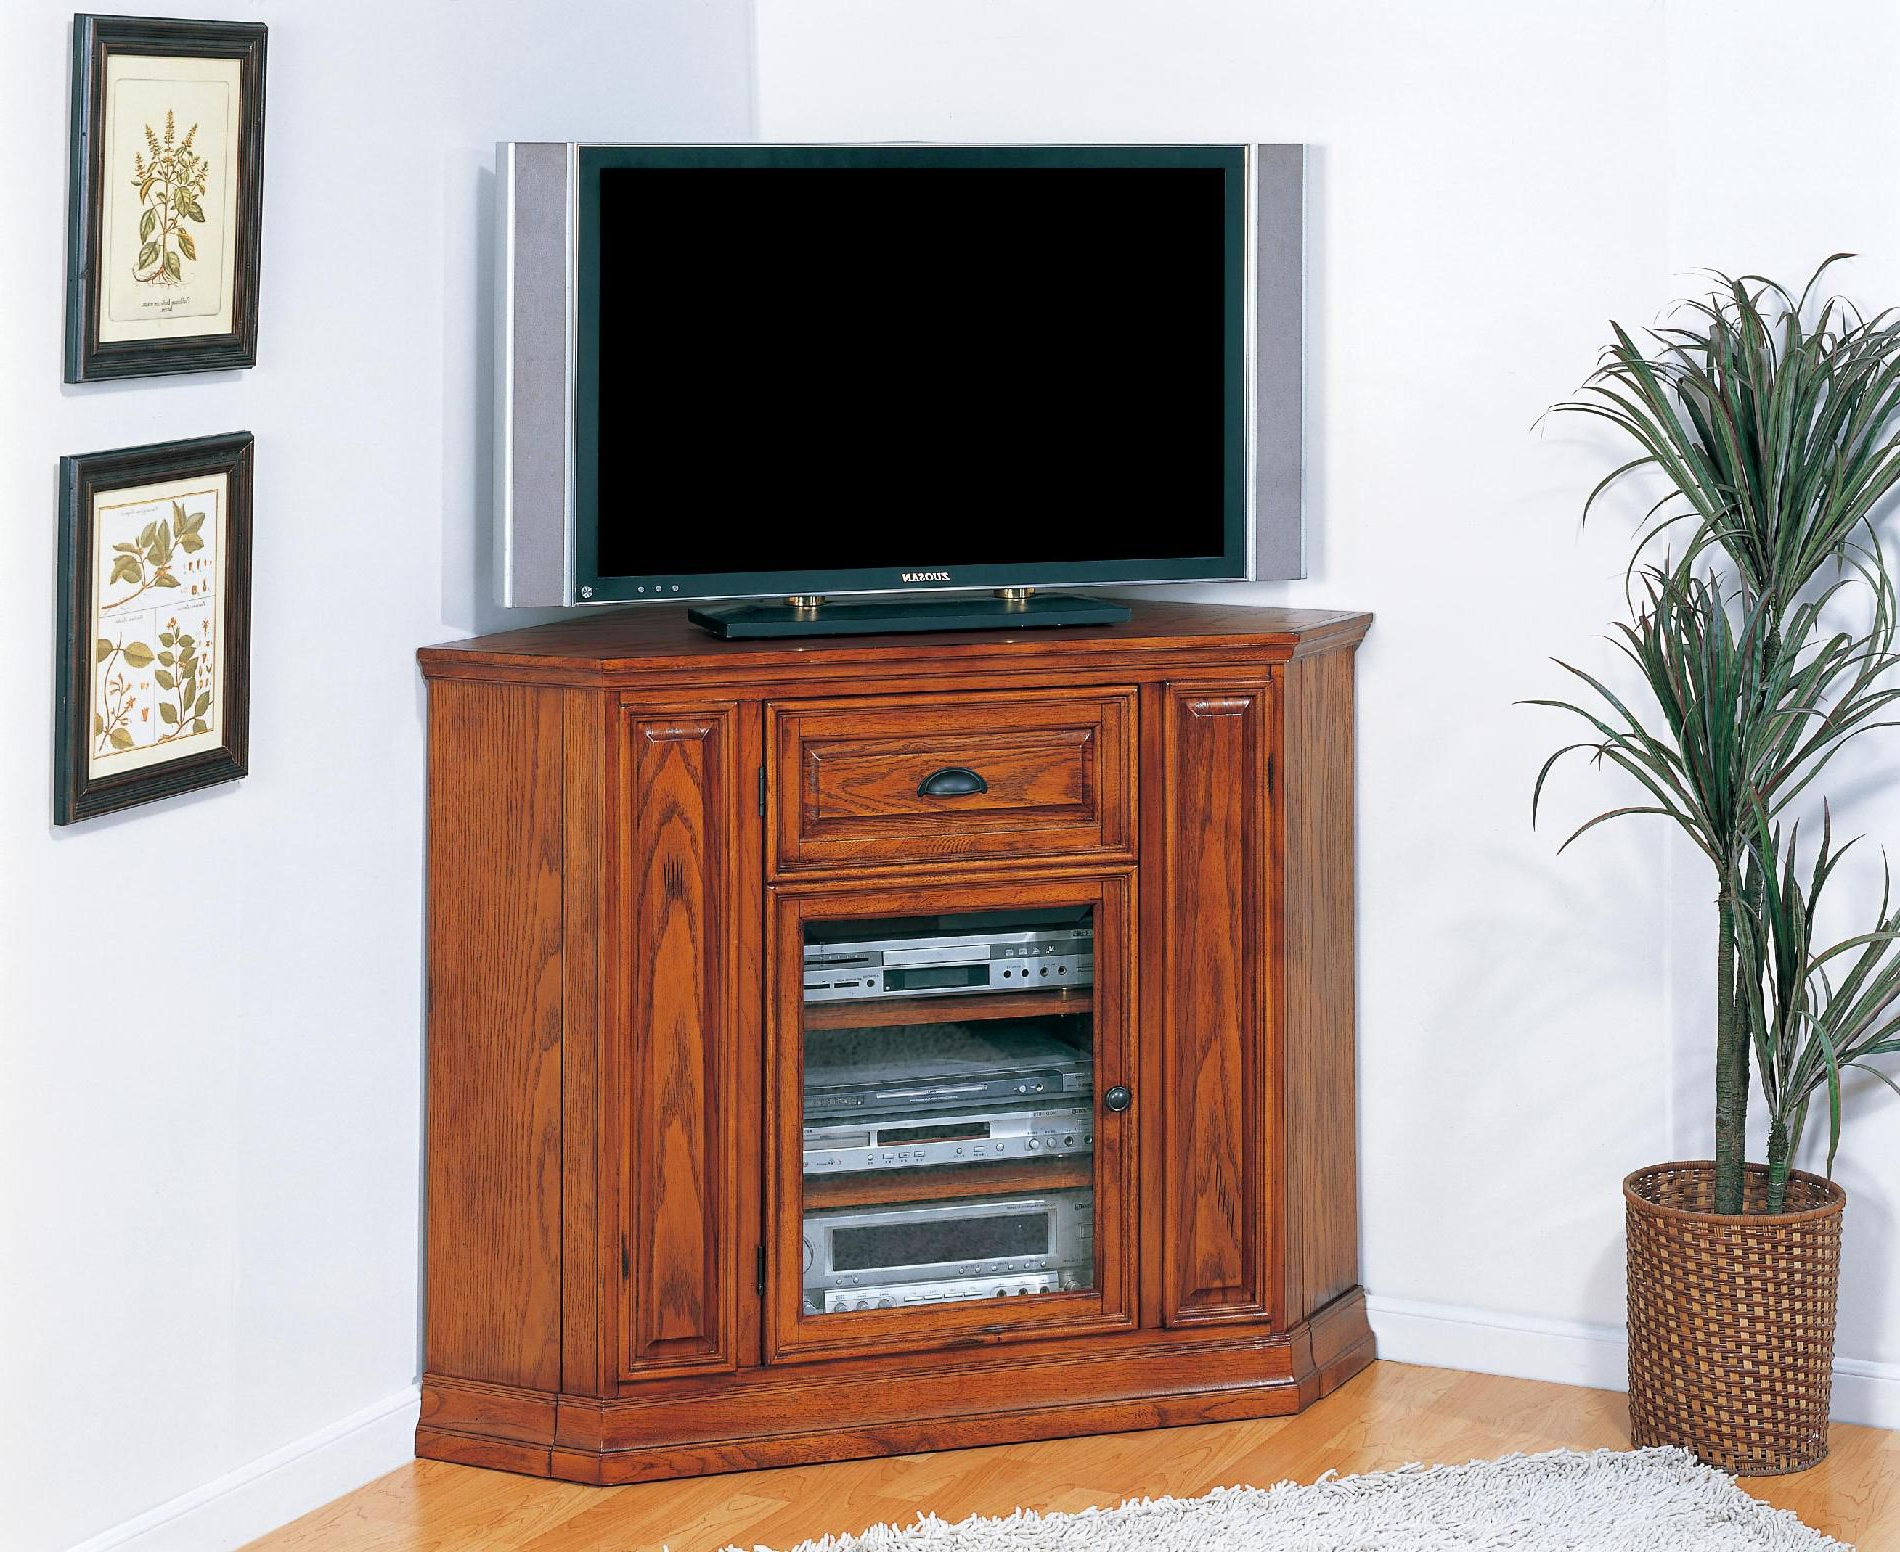 Corner Cabinet Gorgeous Unit Santana Oak Original Large Quercus Regarding Most Recent Santana Oak Tv Furniture (Gallery 16 of 20)